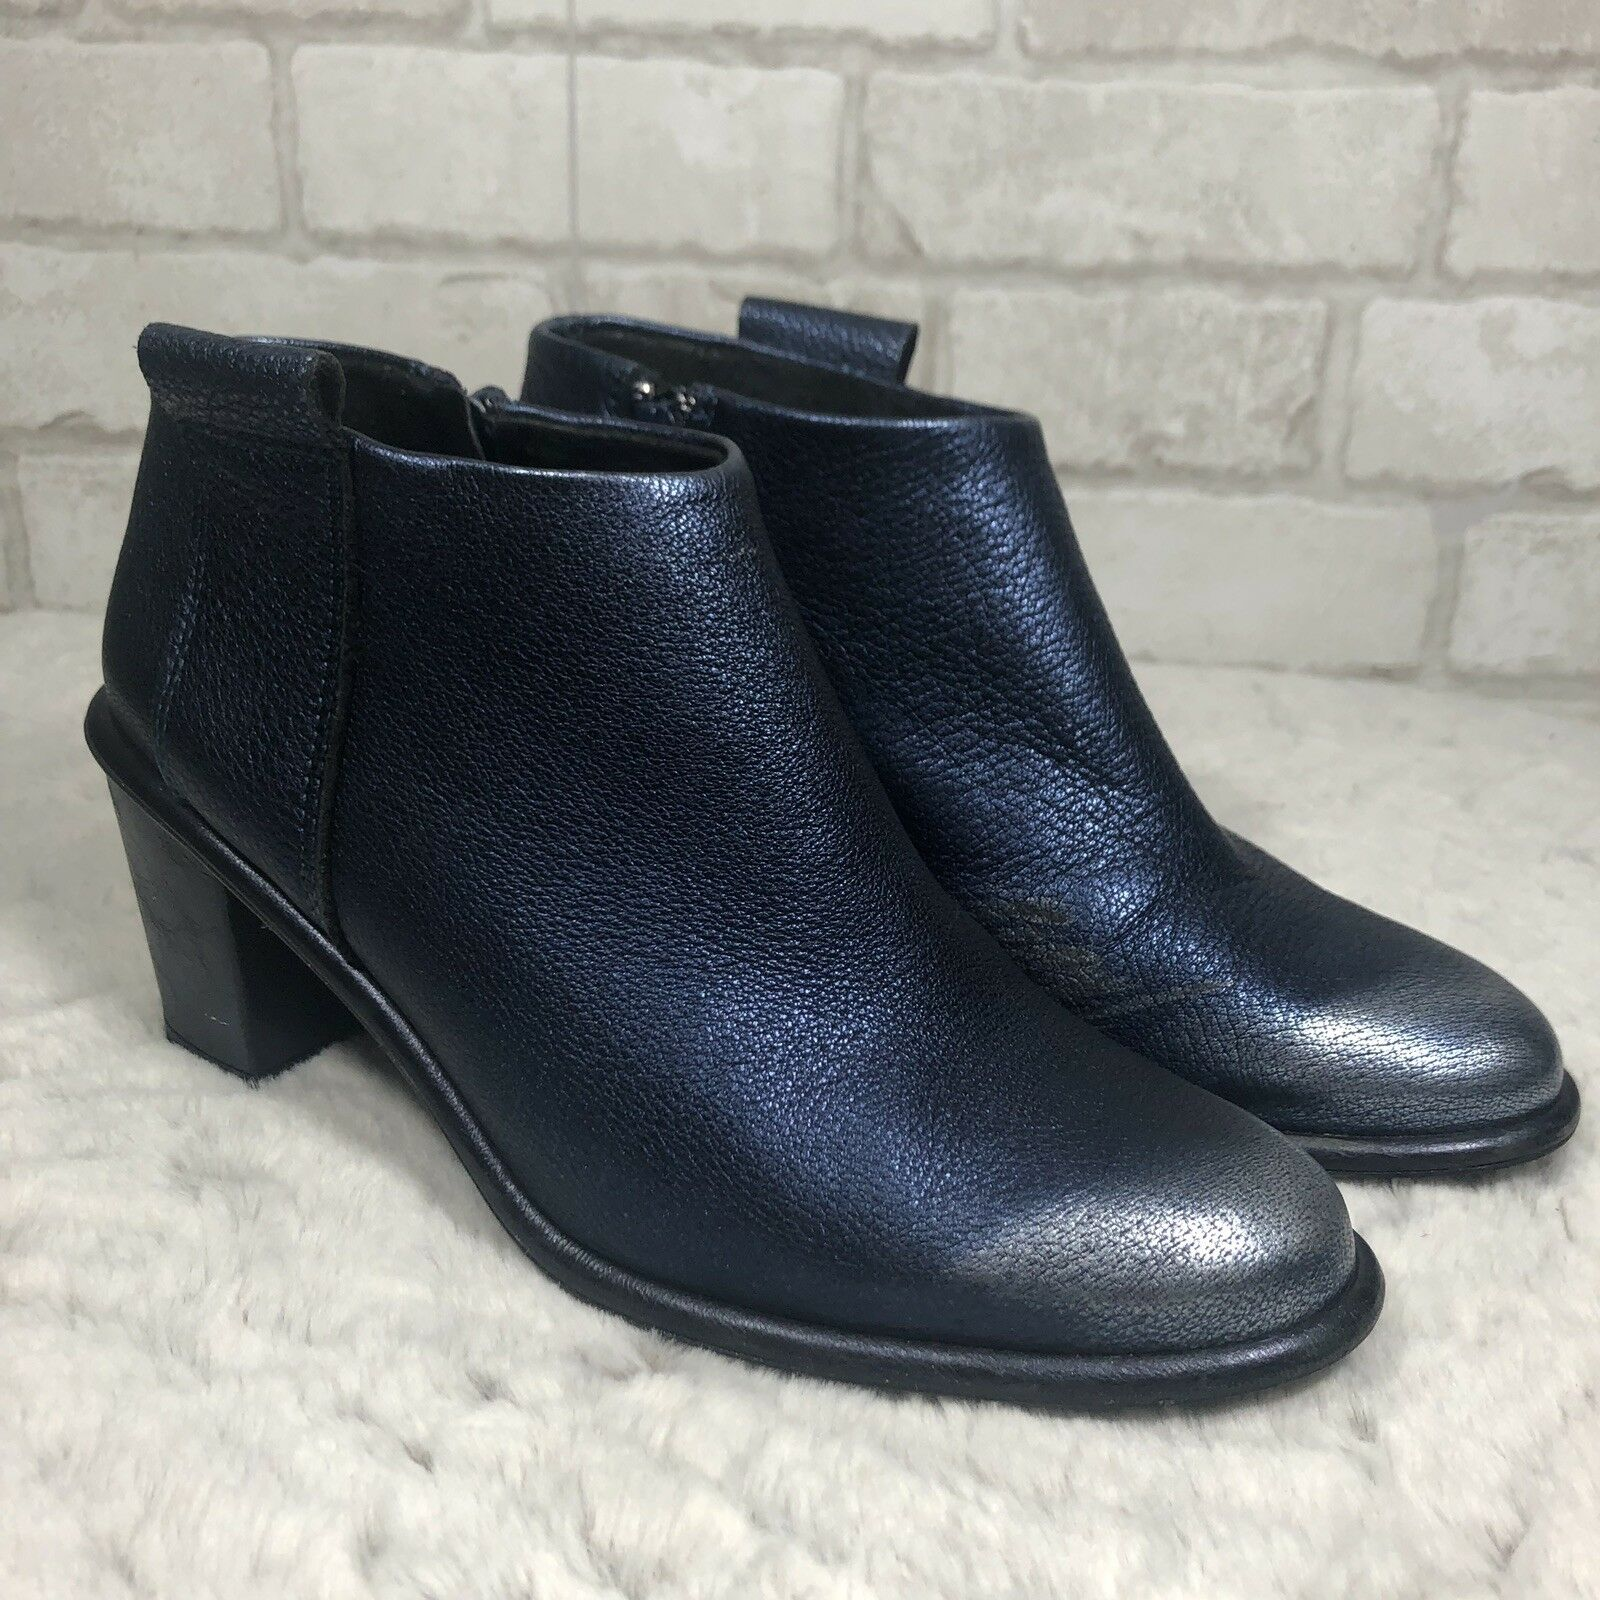 Miista Leather bluee Silver Metallic Zipper Ankle Bootie Chunky Heel SzUS8 ( K15)